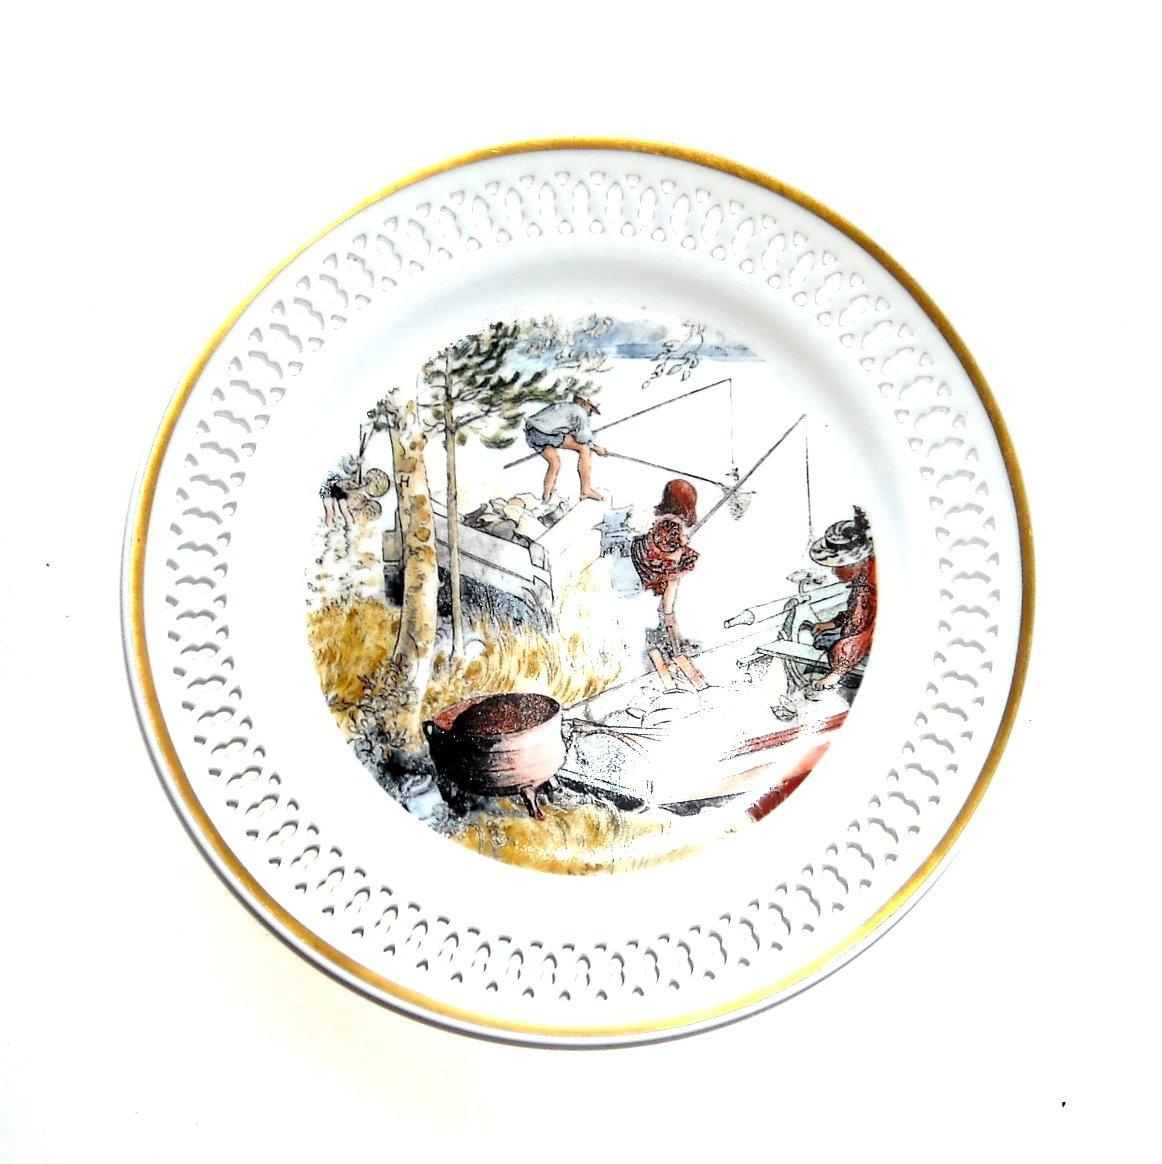 Carl Larsson Bing Grondahl Krebsefangst No 9 Plate